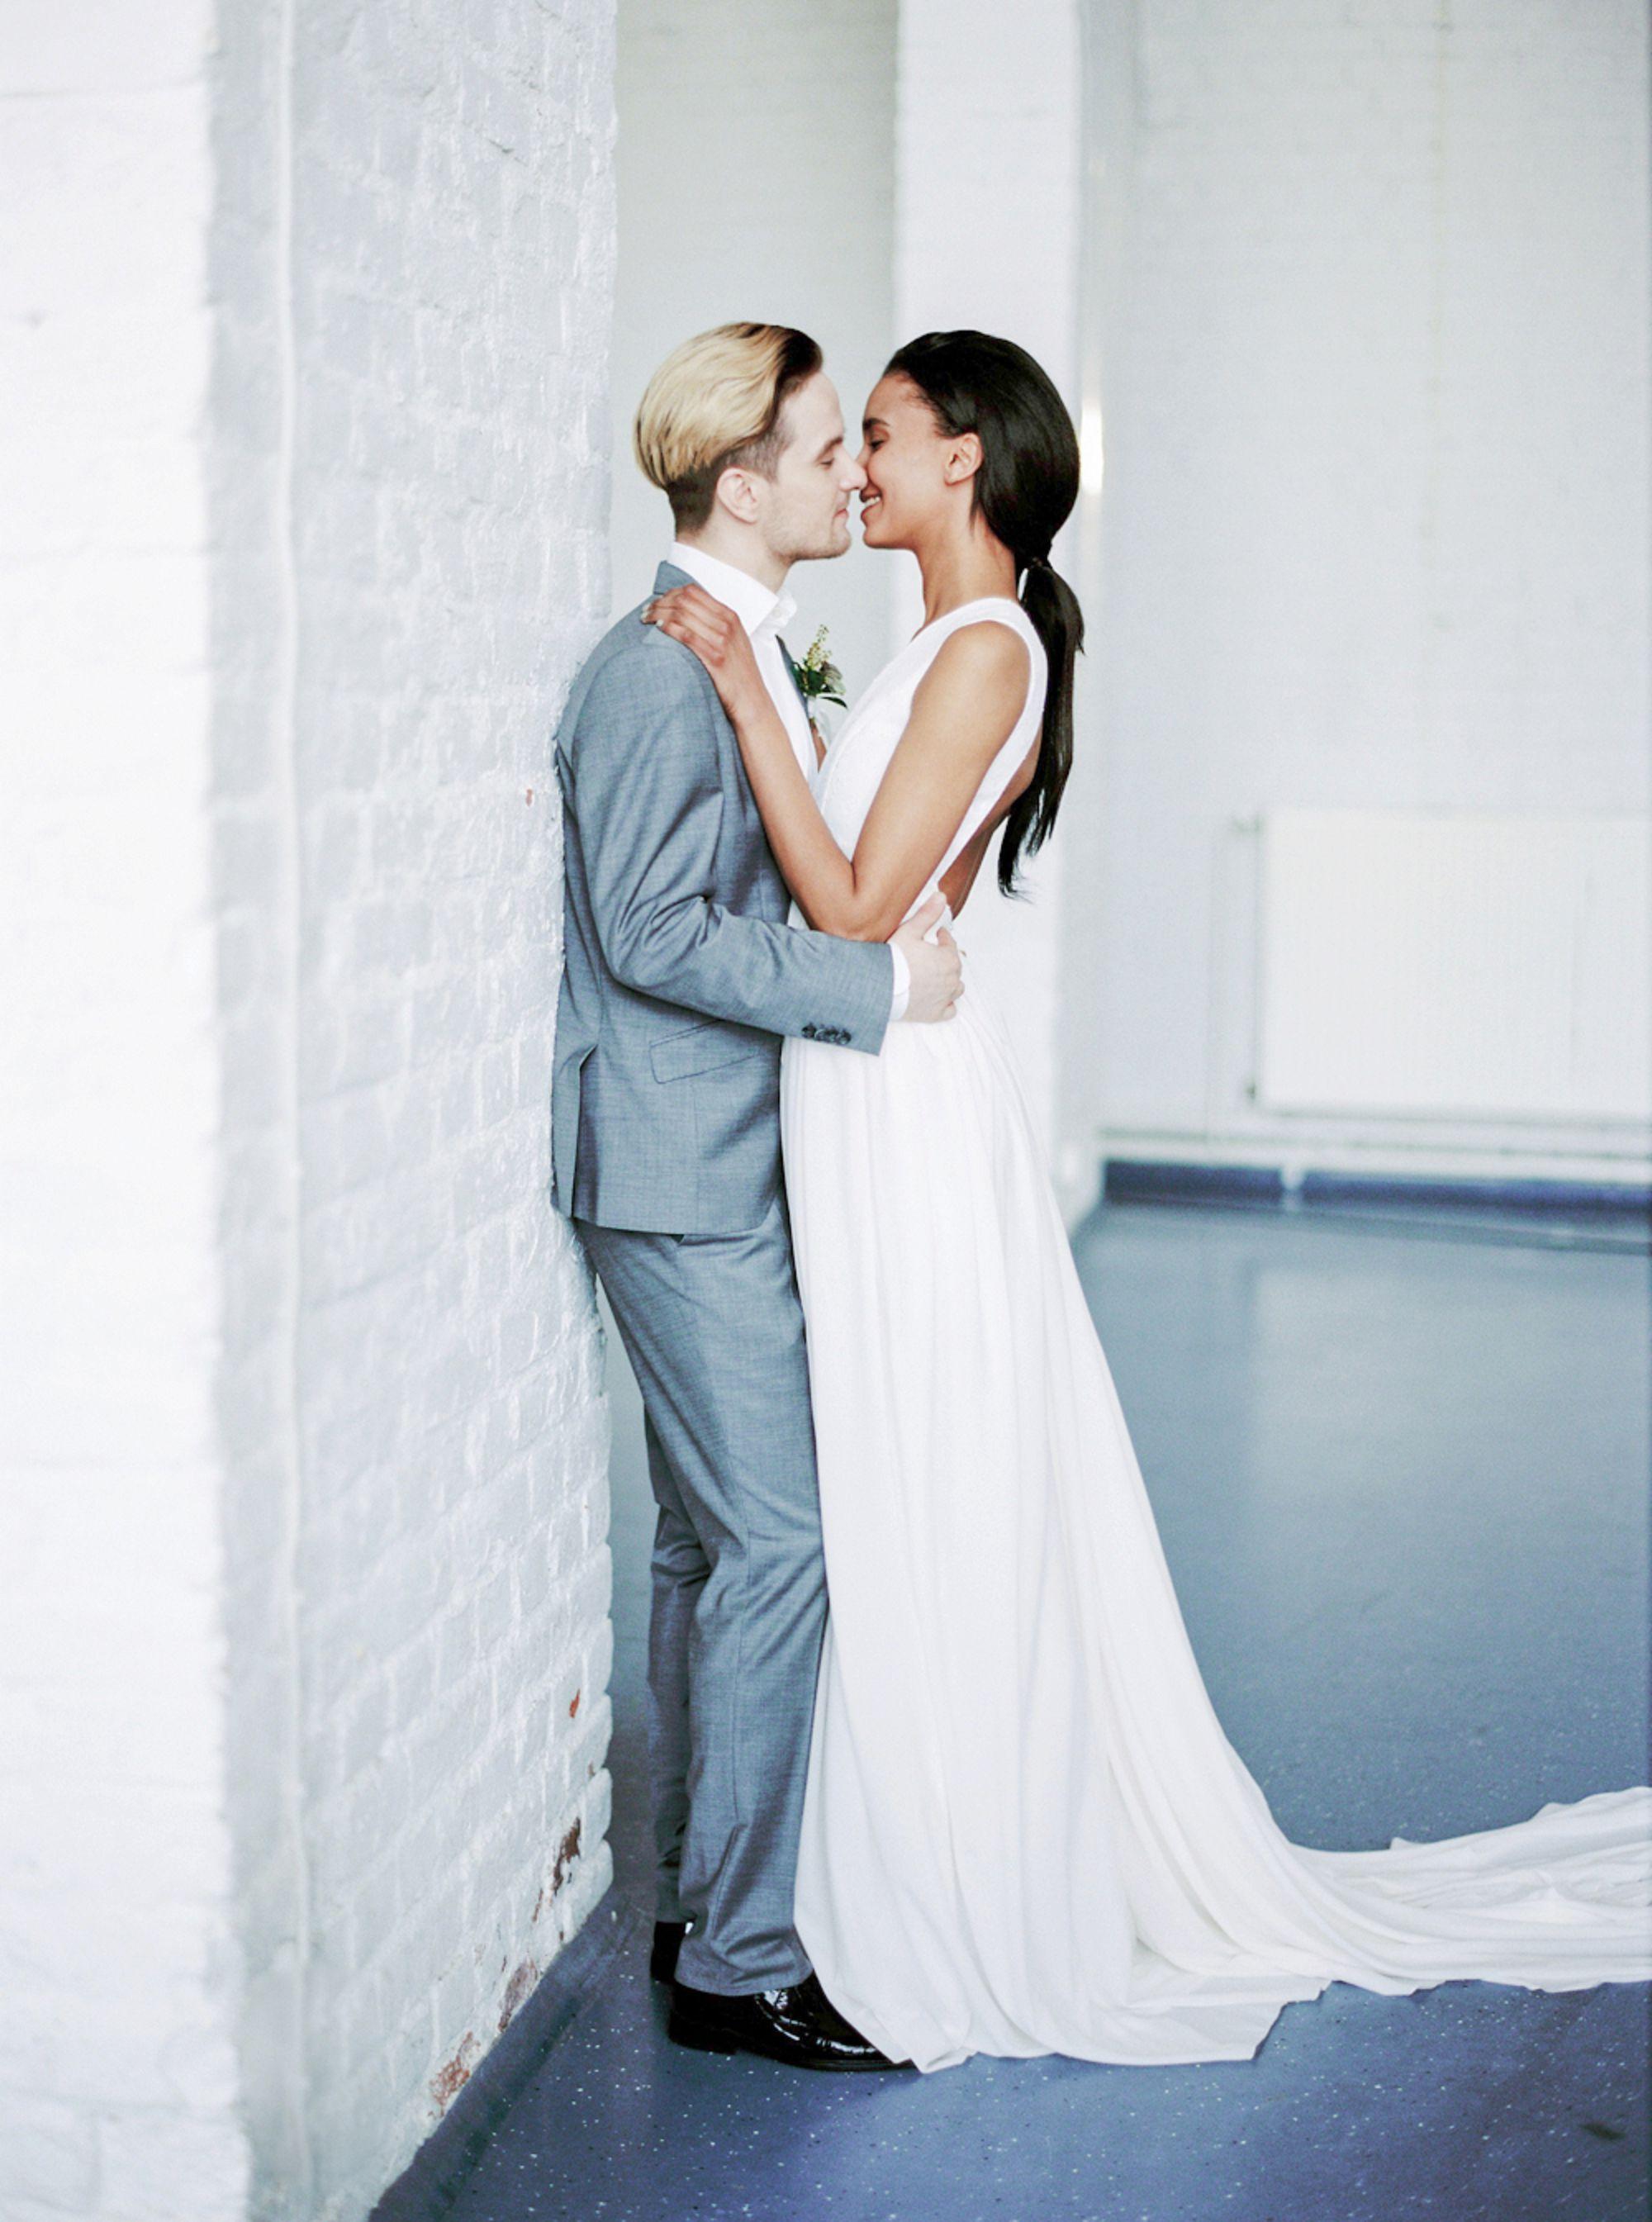 katja-scherle-festtagsfotografien_berlin-hamburg-filmweddingphotographer-hochzeitsfotograf-analog-minimalistic-wedding_0050